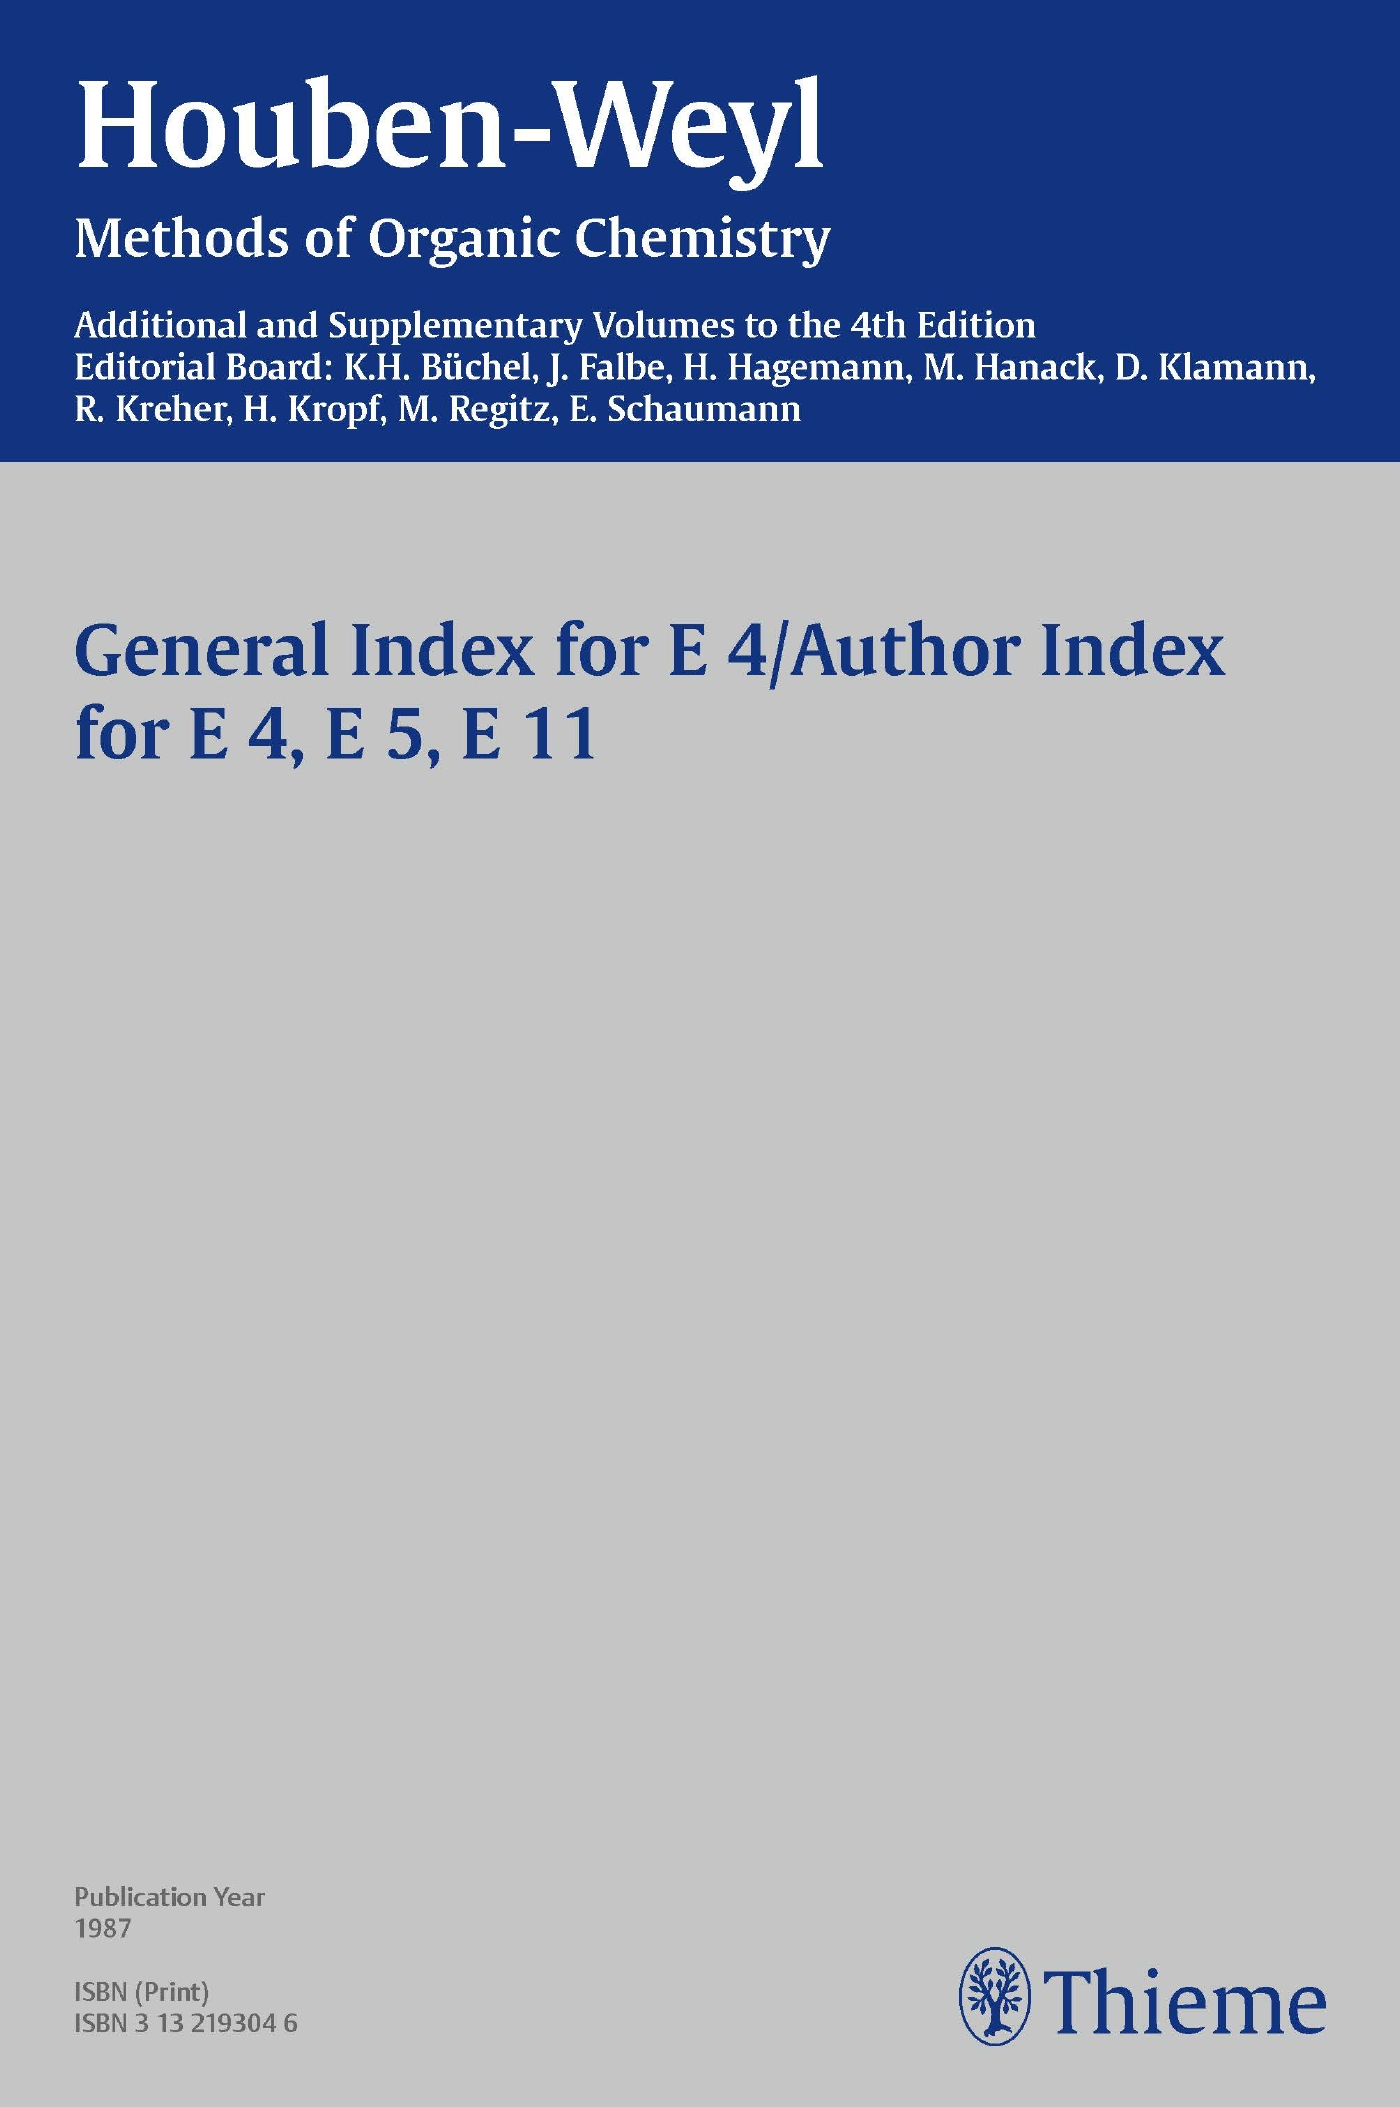 Houben-Weyl Methods of Organic Chemistry General Index E 4, E5, E 11, 4th Edition Supplement